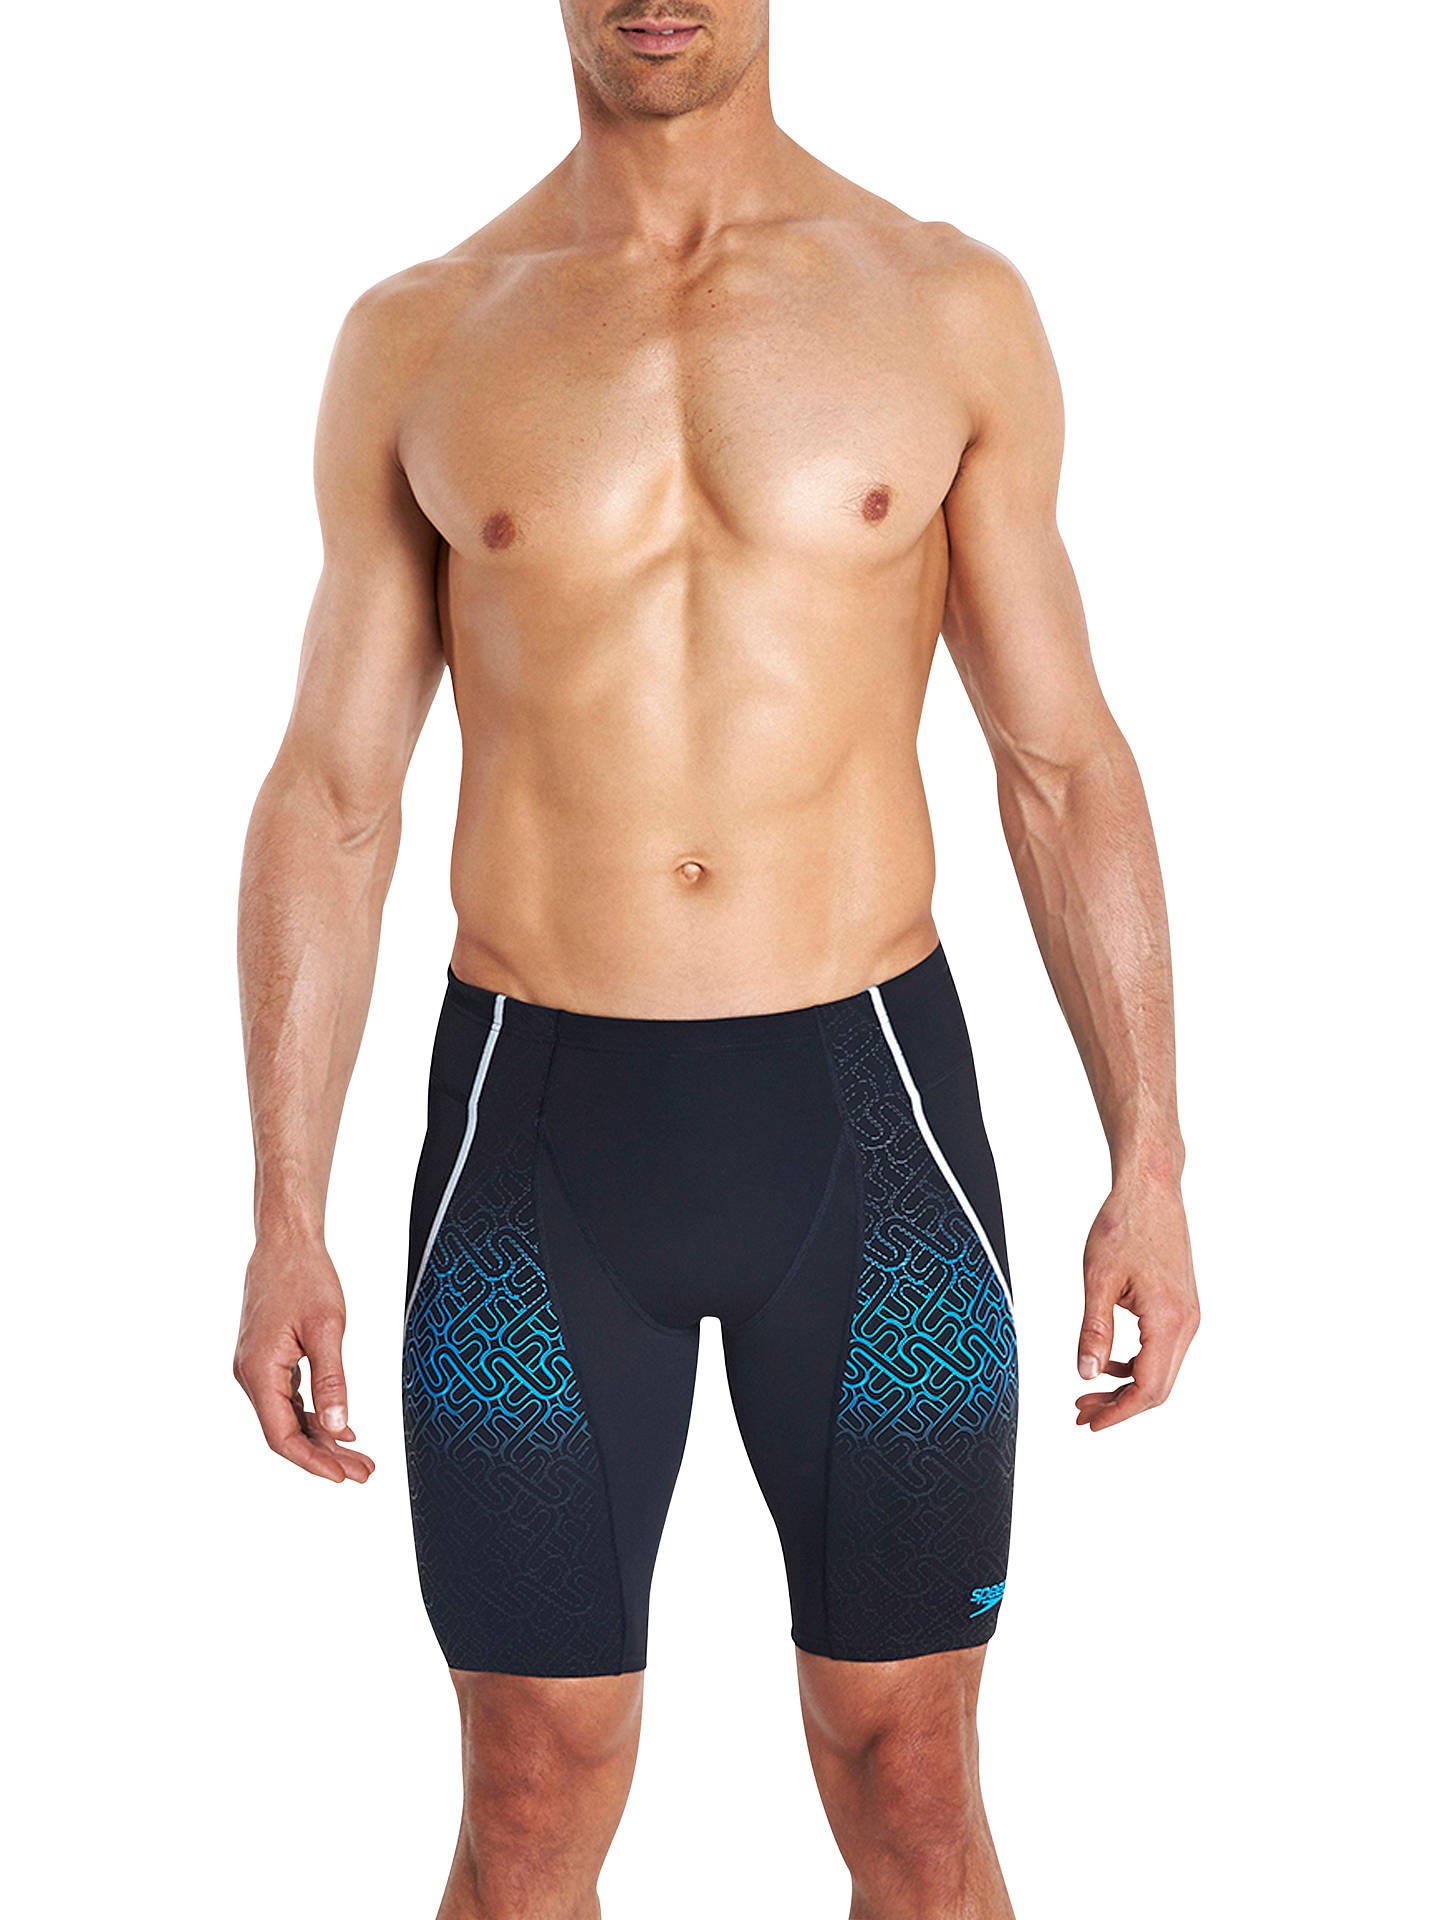 d2d151615c Buy Speedo Fit Pinnacle V Endurance Jammer Swim Shorts, Black/Japan Blue,  30 ...